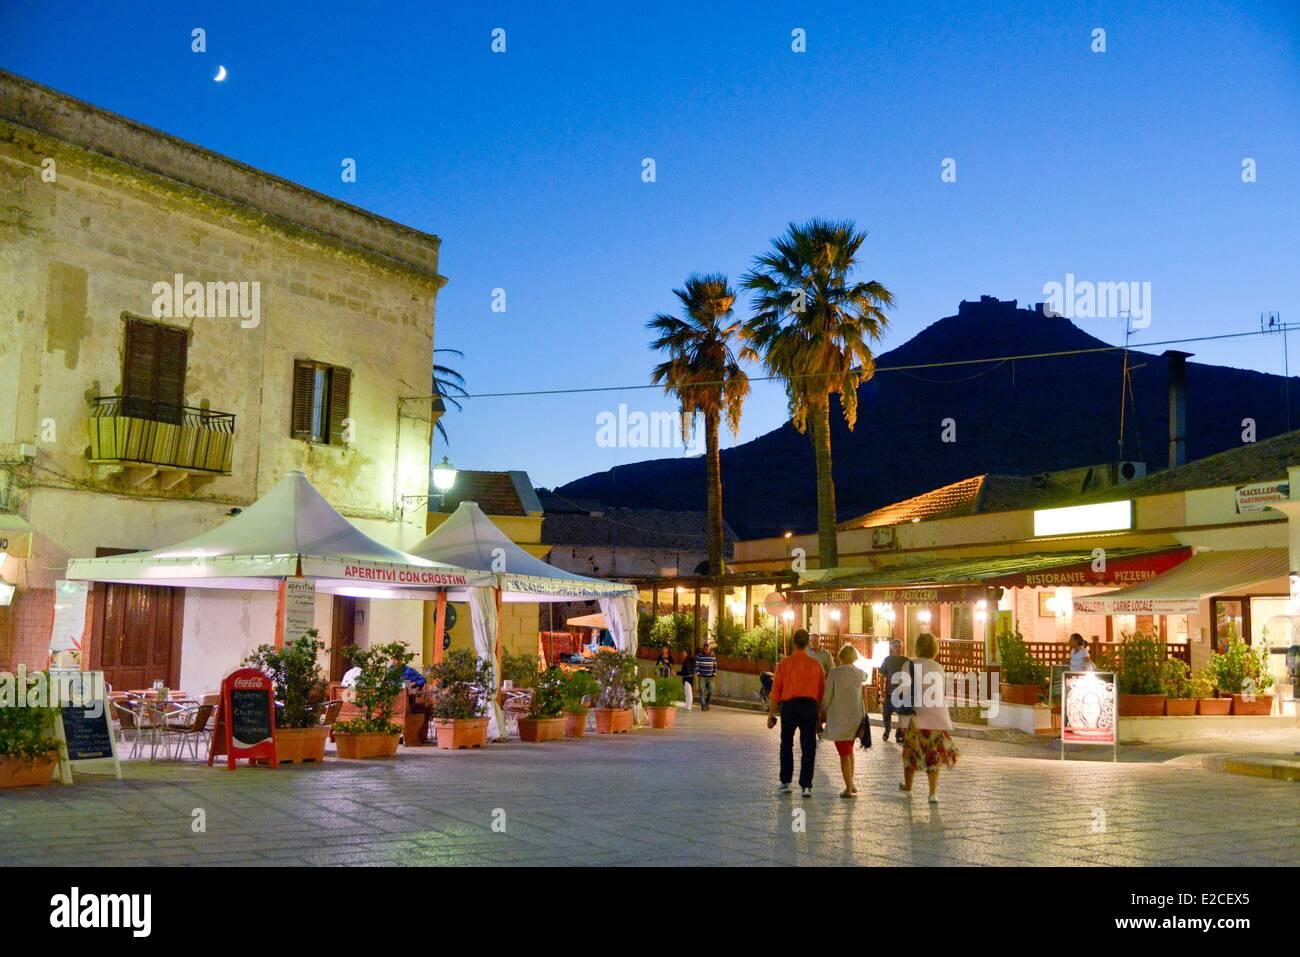 Italien, Sizilien, Ägadischen Inseln, Insel Favignana, Piazza Europa, Spaziergänger vor Caféterrassen Stockbild